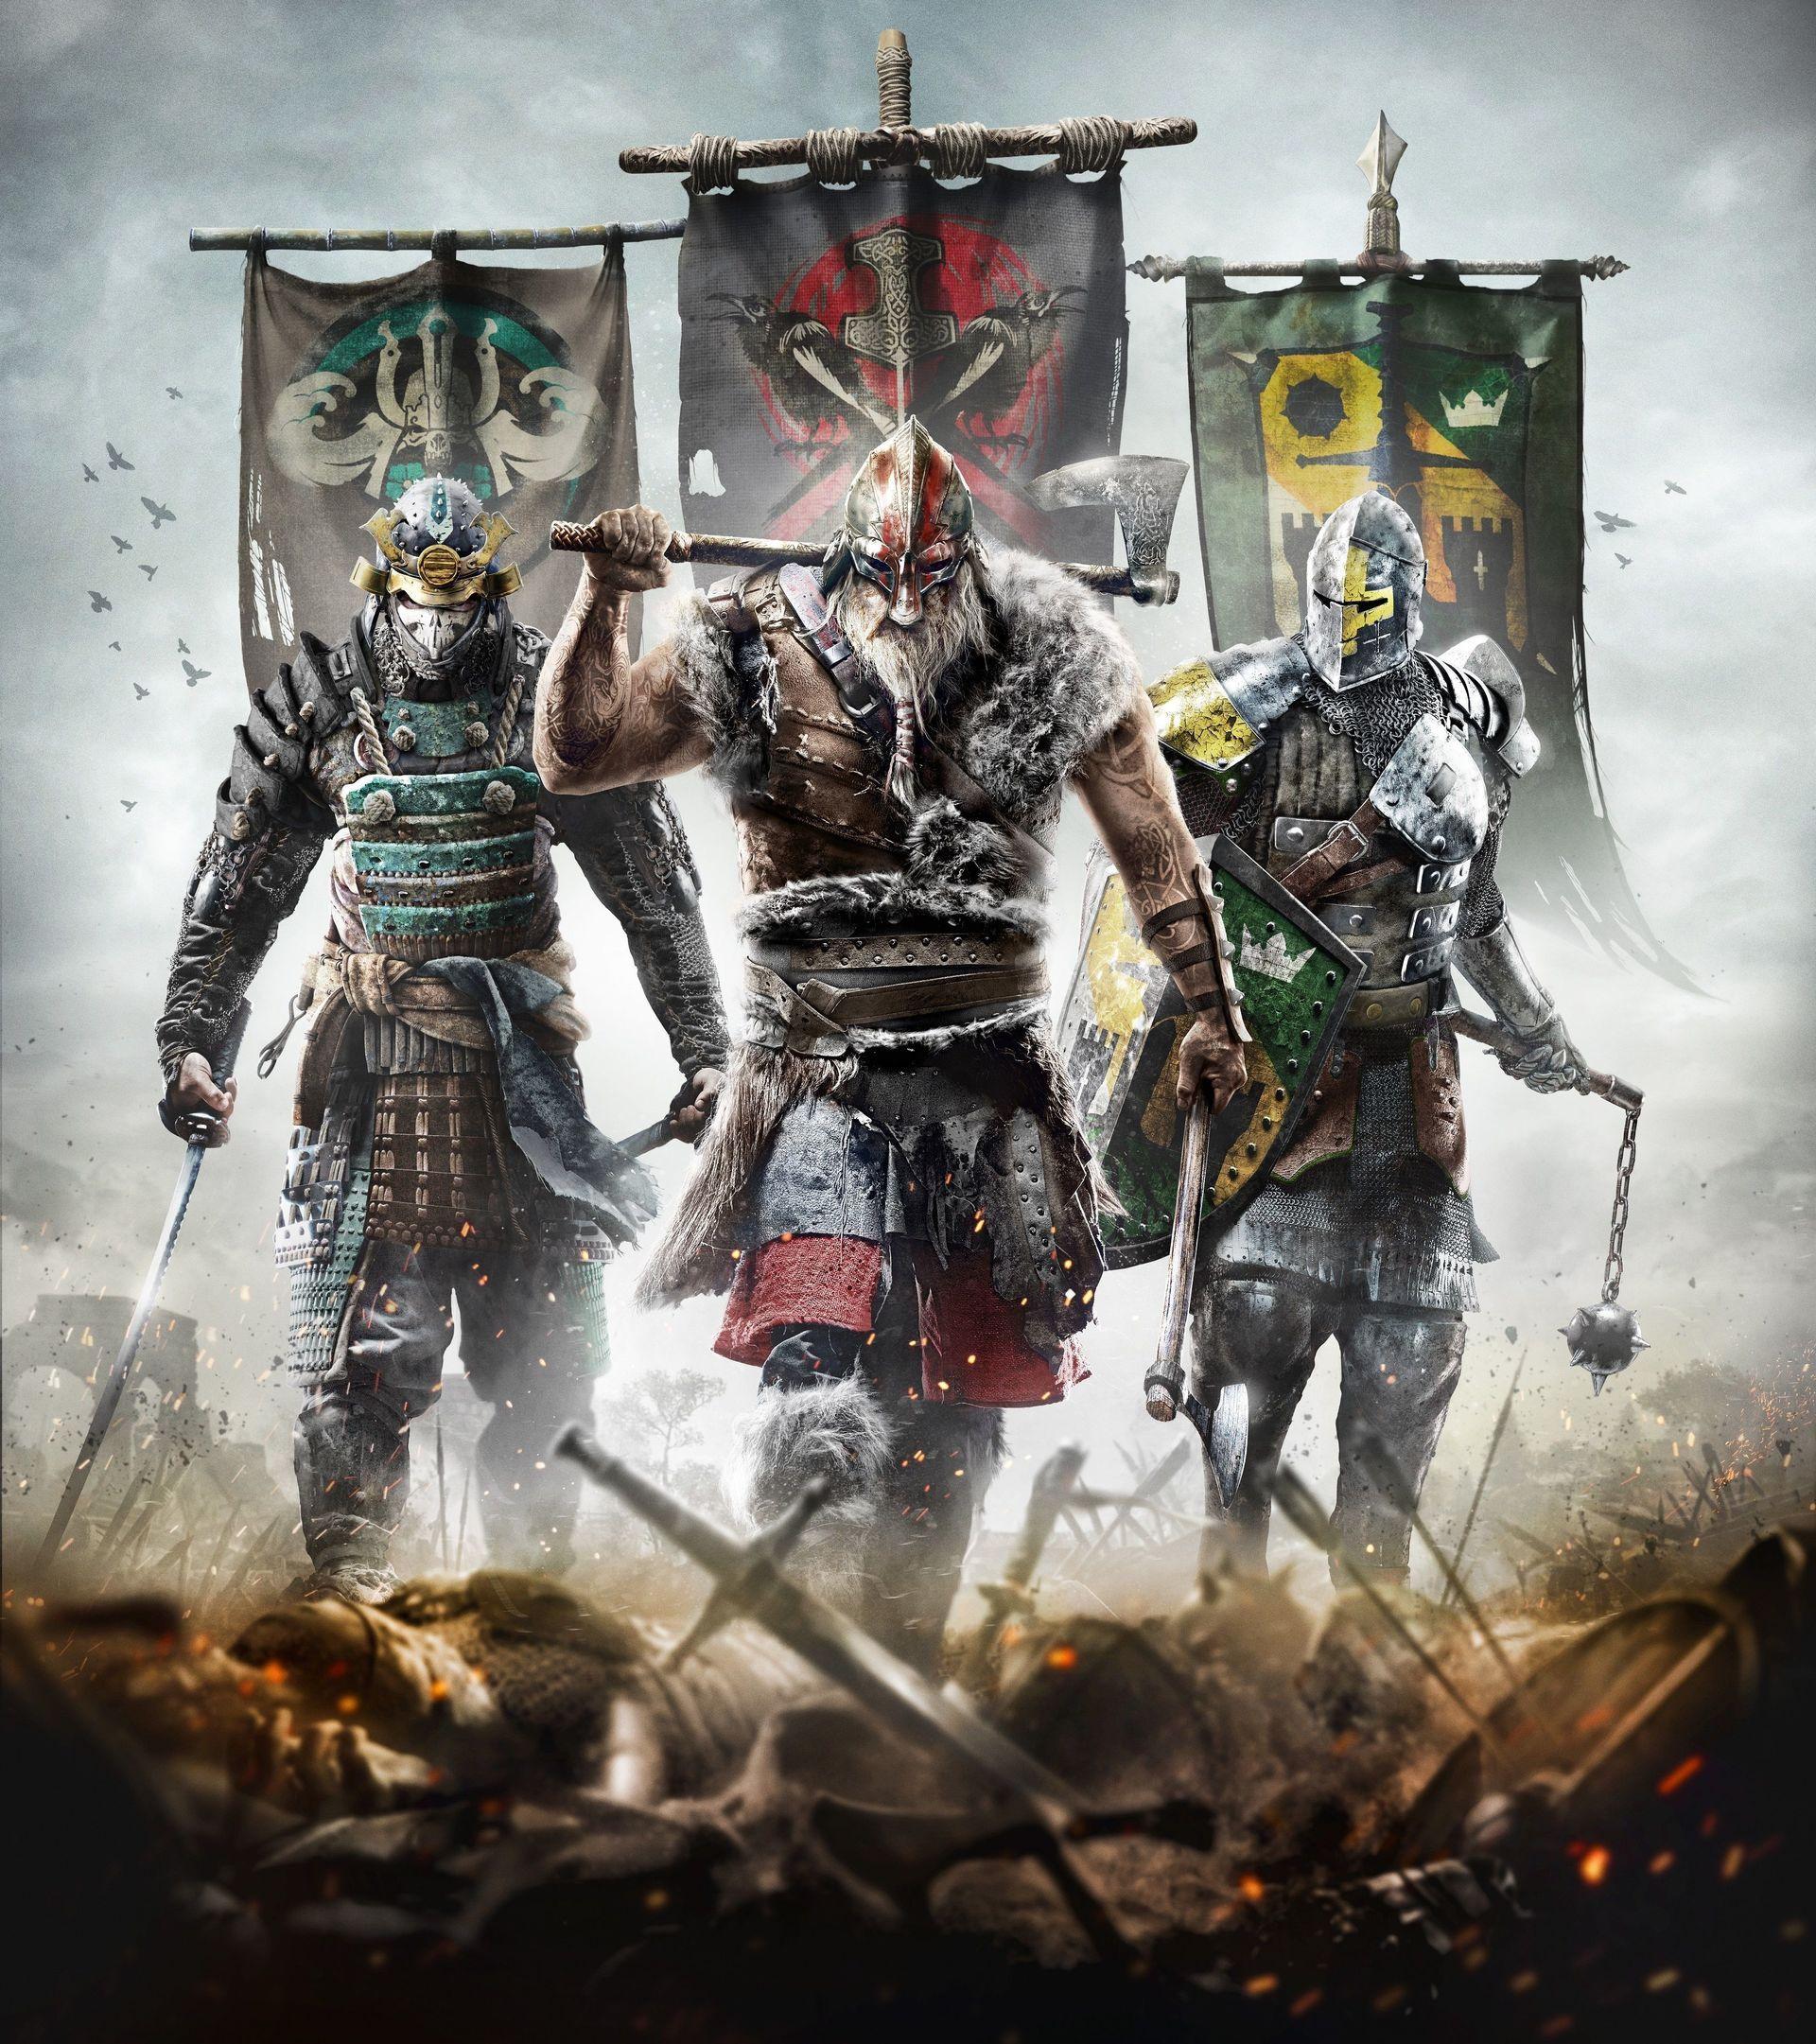 For Honor Forhonor Ubisoft Pc Ps4 Xboxone Vikings Samurais Medieval Adventure Games Videogames For Honour Game Fantasy Art Art